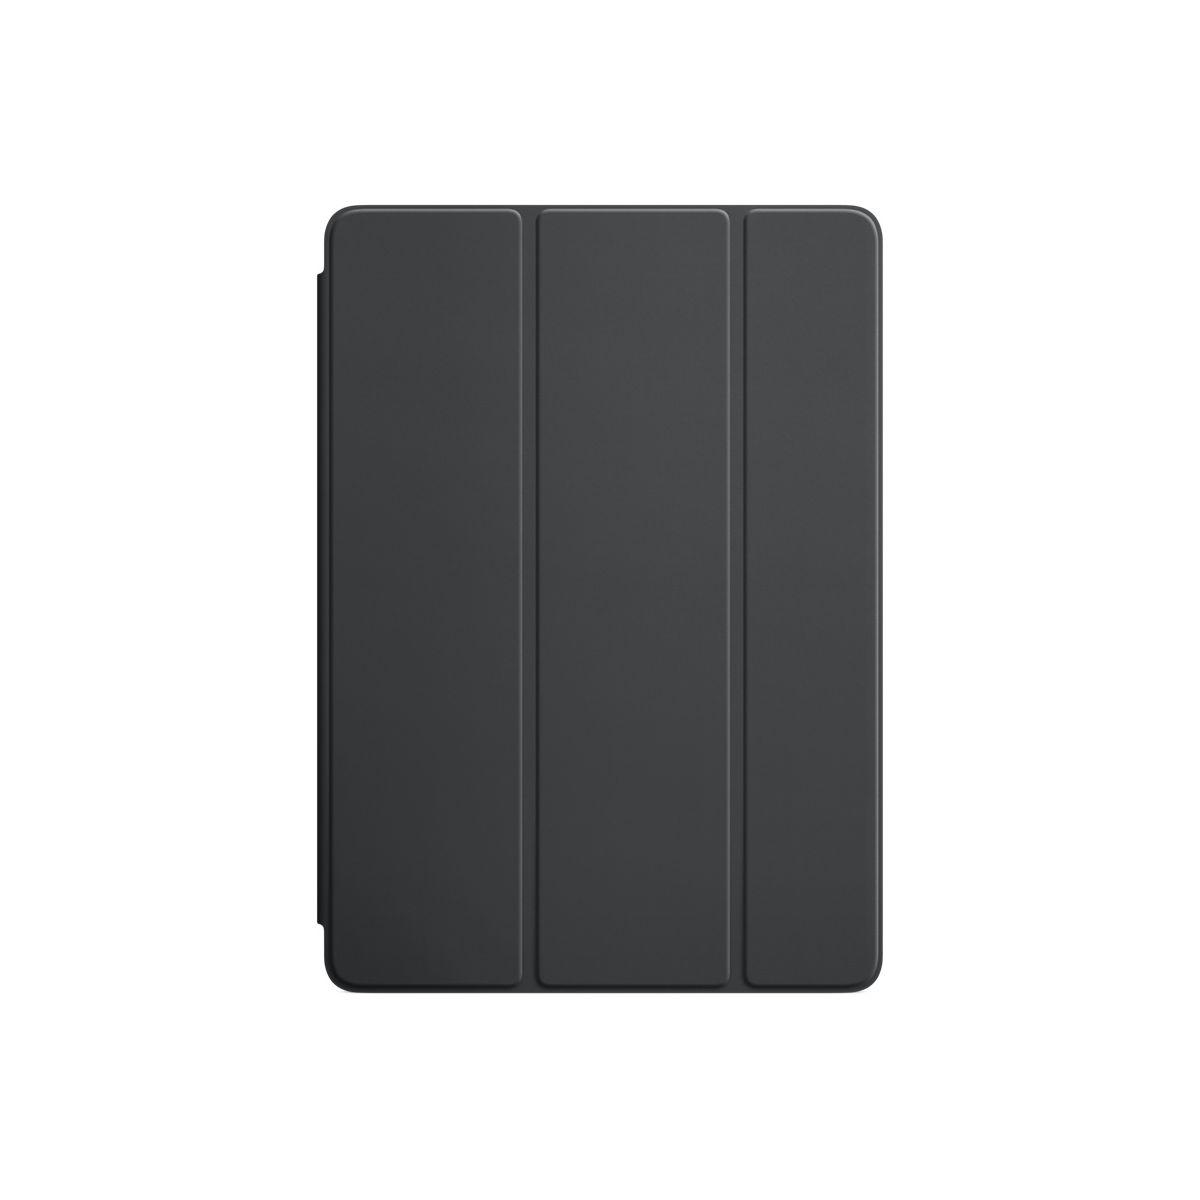 Etui tablette apple smart cover new ipad gris (photo)